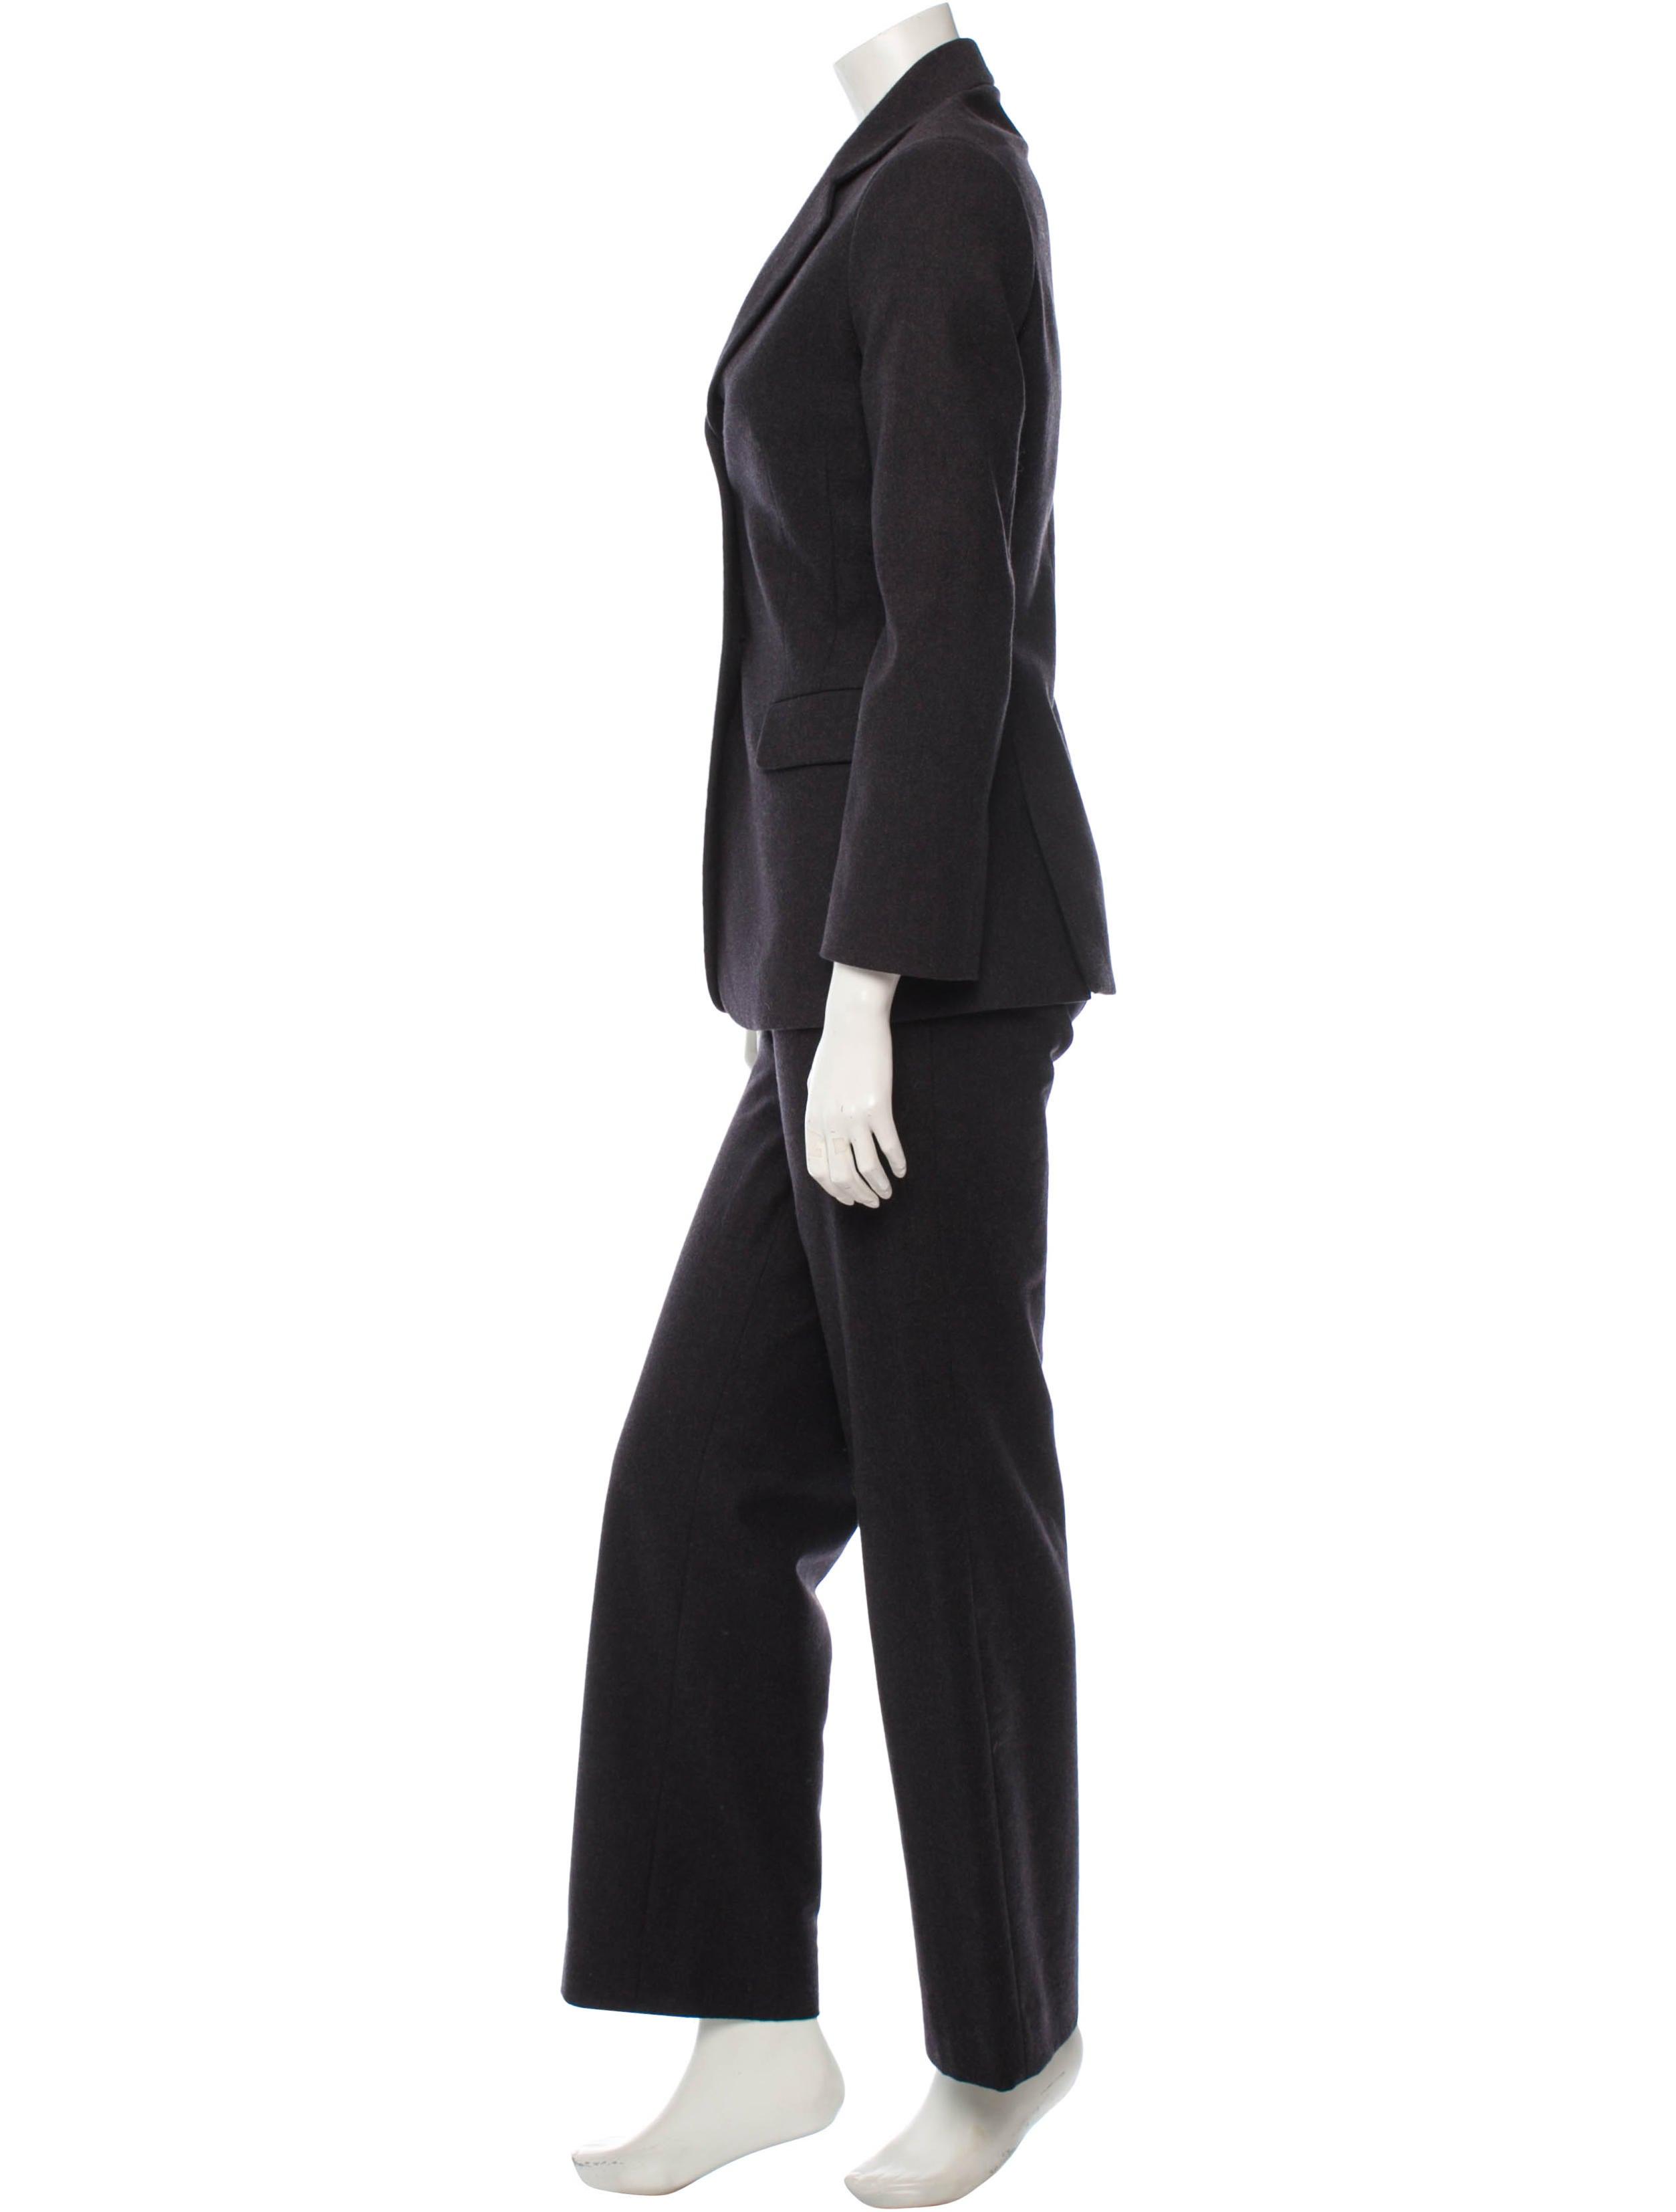 Salvatore Ferragamo Pantsuit - Clothing - SAL24179 - The ...